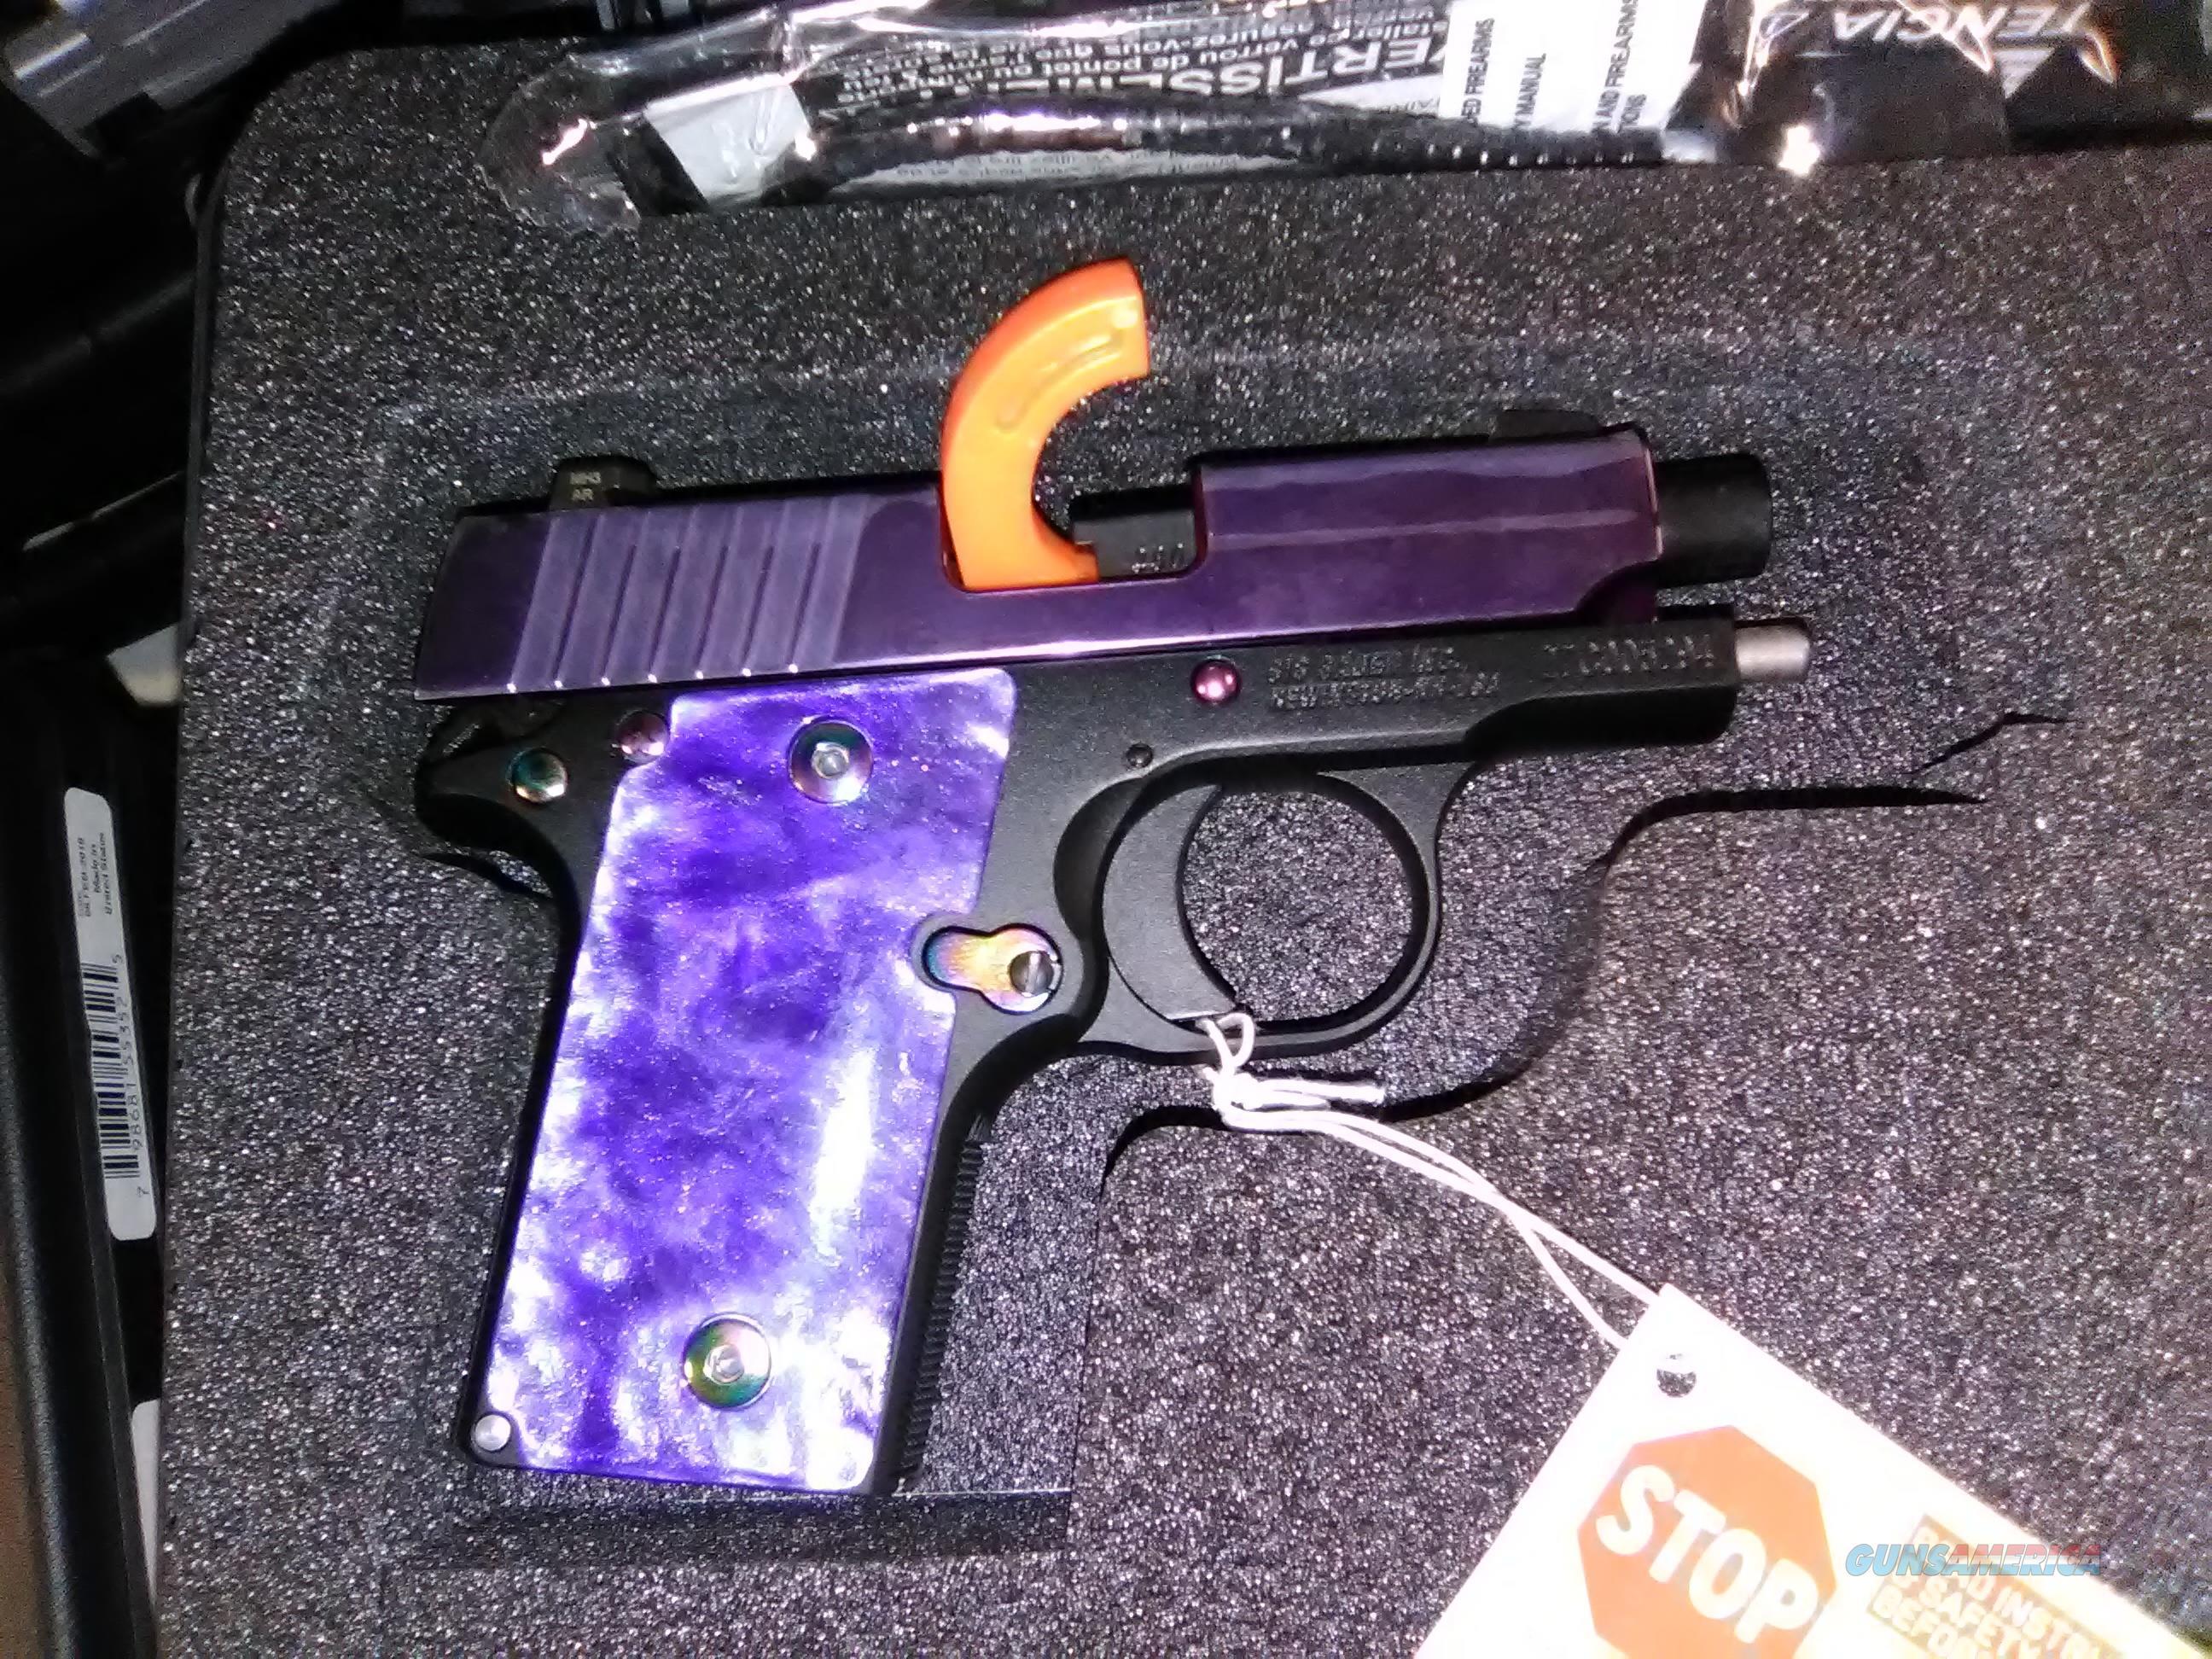 SIG SAUER P238 380ACP PURPLE SLITE 238-380-PSP  Guns > Pistols > Sig - Sauer/Sigarms Pistols > P238